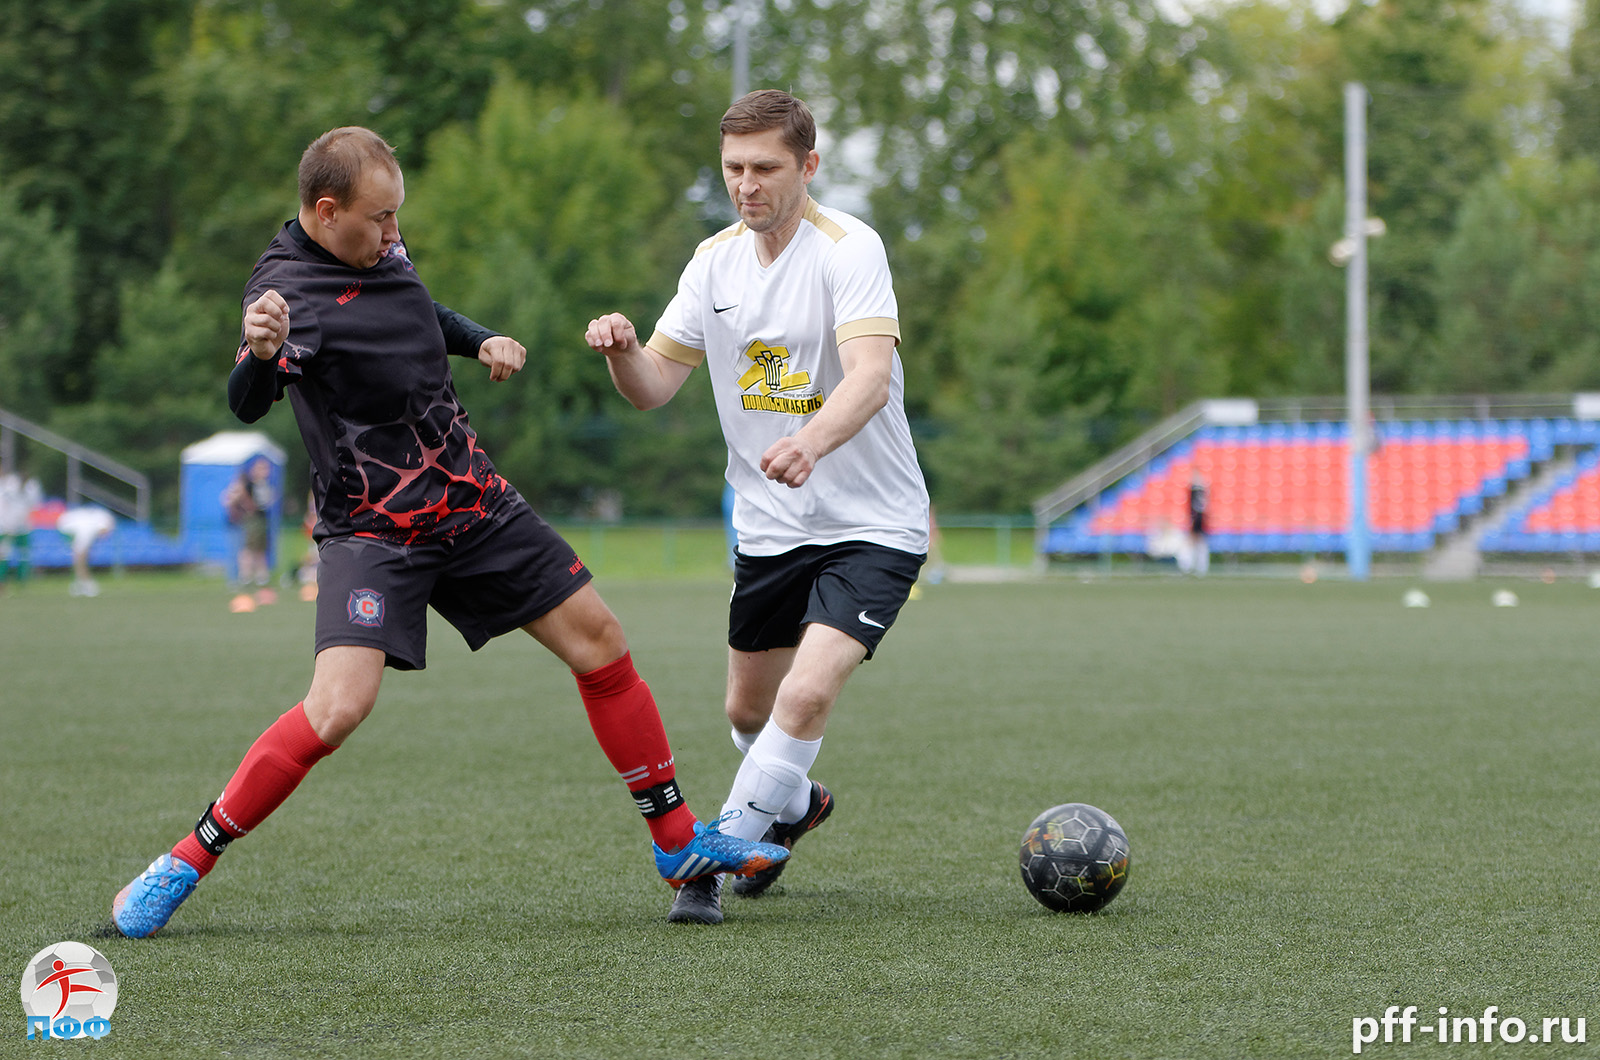 Премьер-лига ТДК. 15 тур. Матч тура